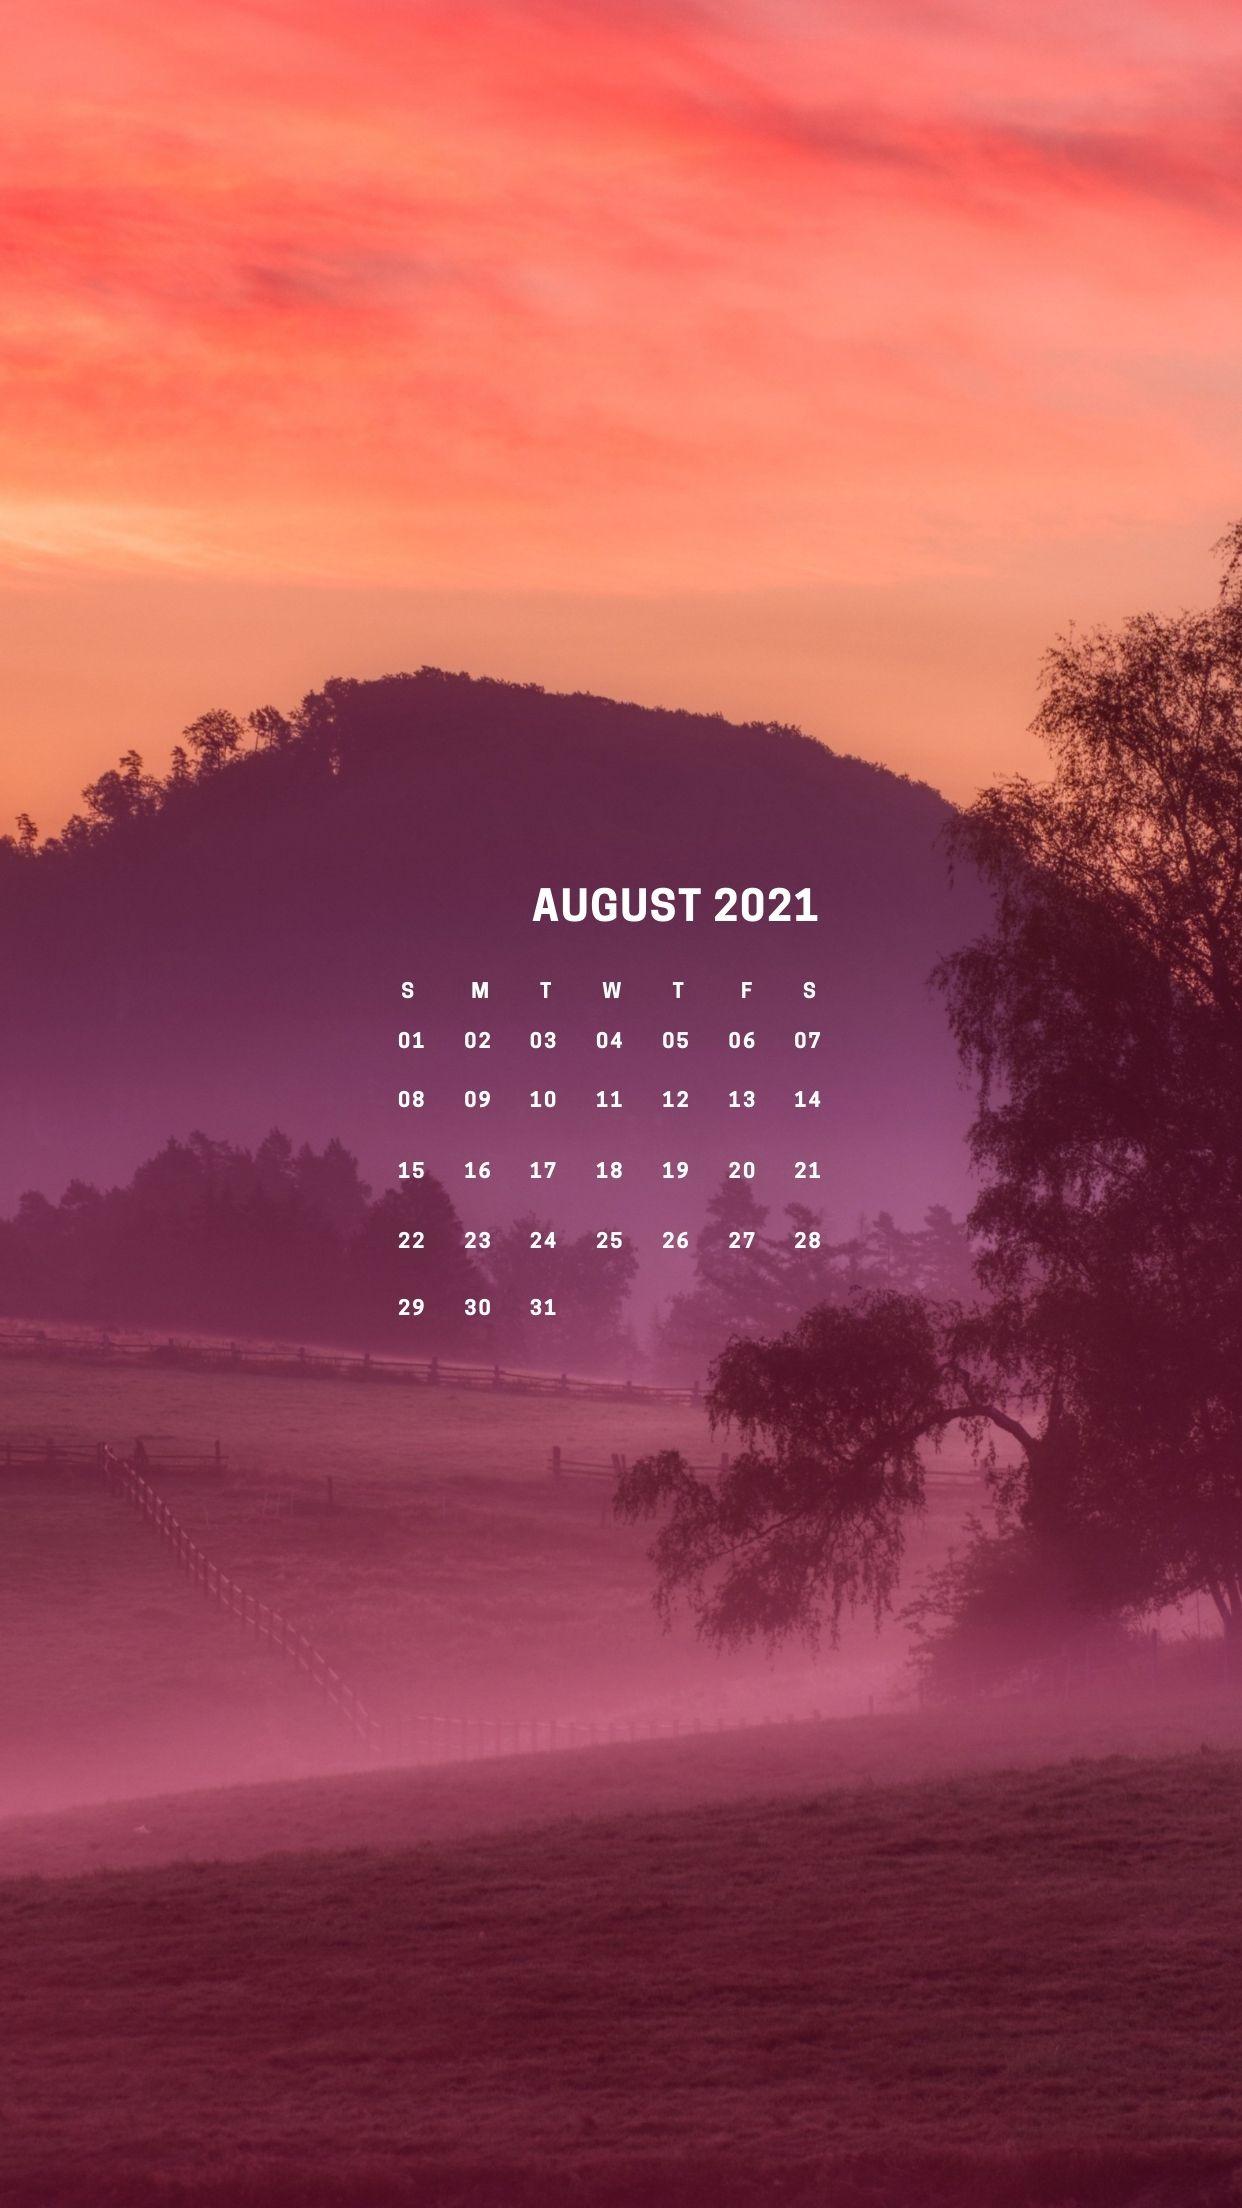 August 2021 Calendar   wishes db 1242x2208